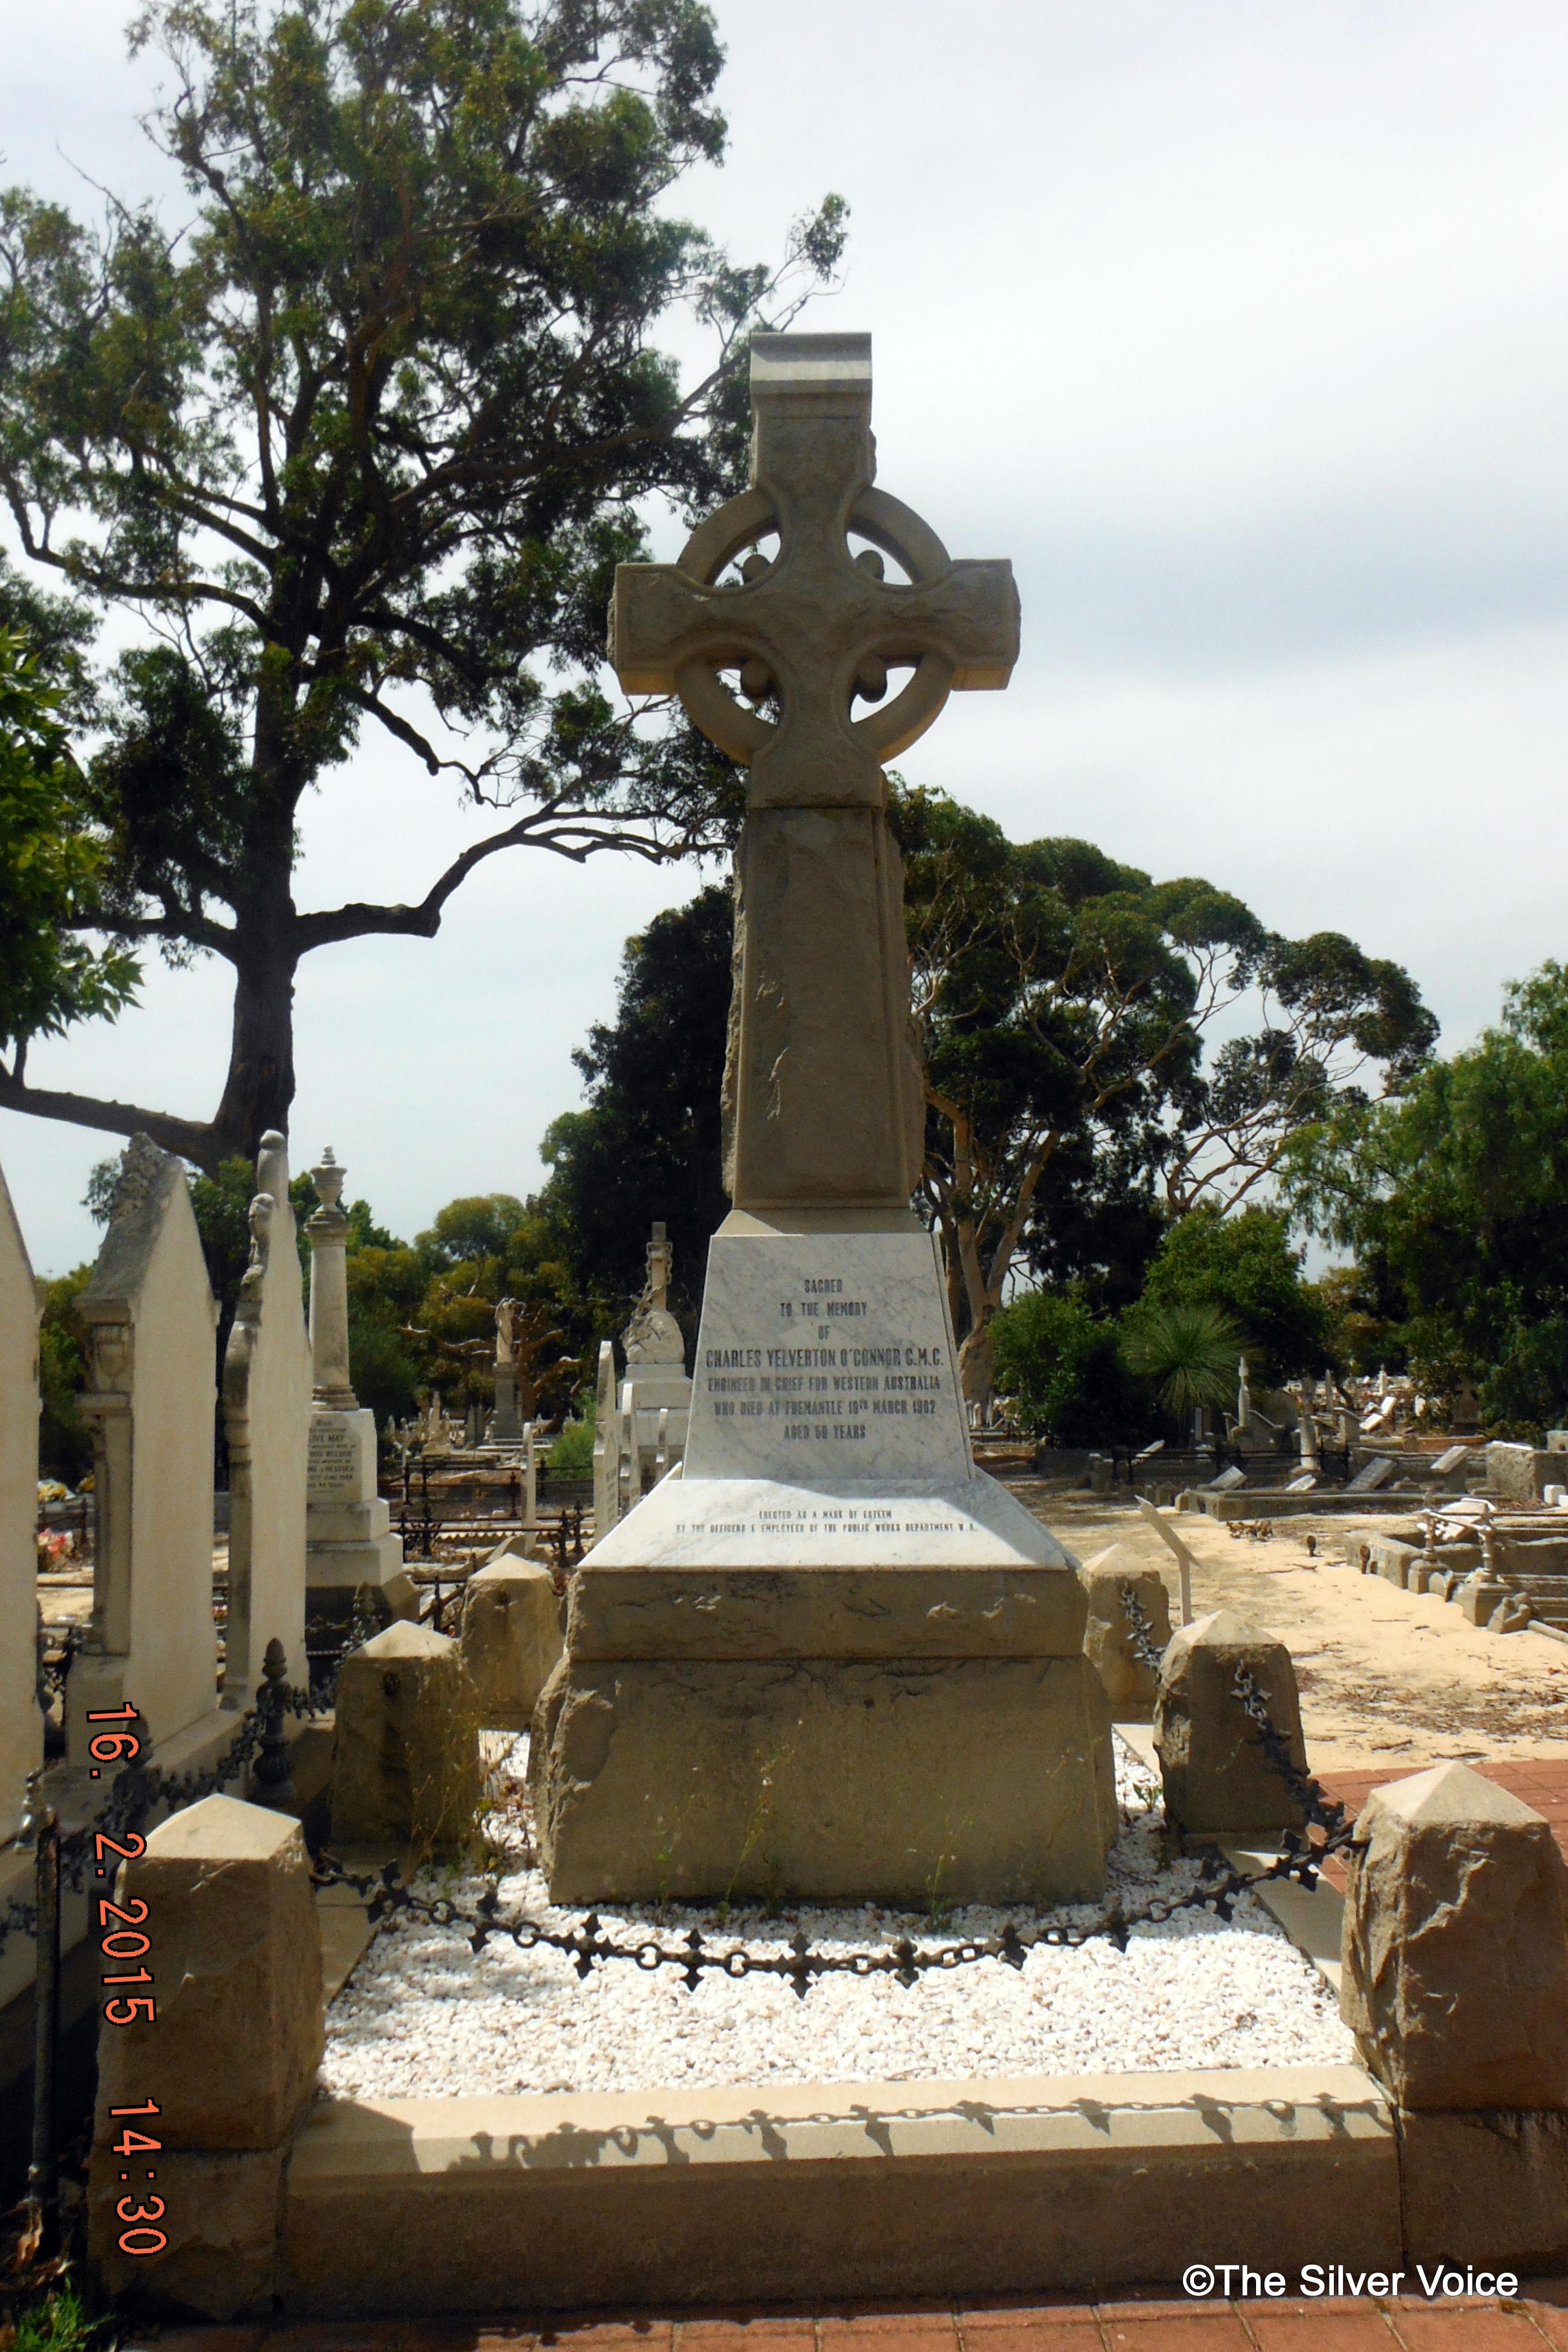 The grave of Charles Yelverton O'Connor, proud Irishman